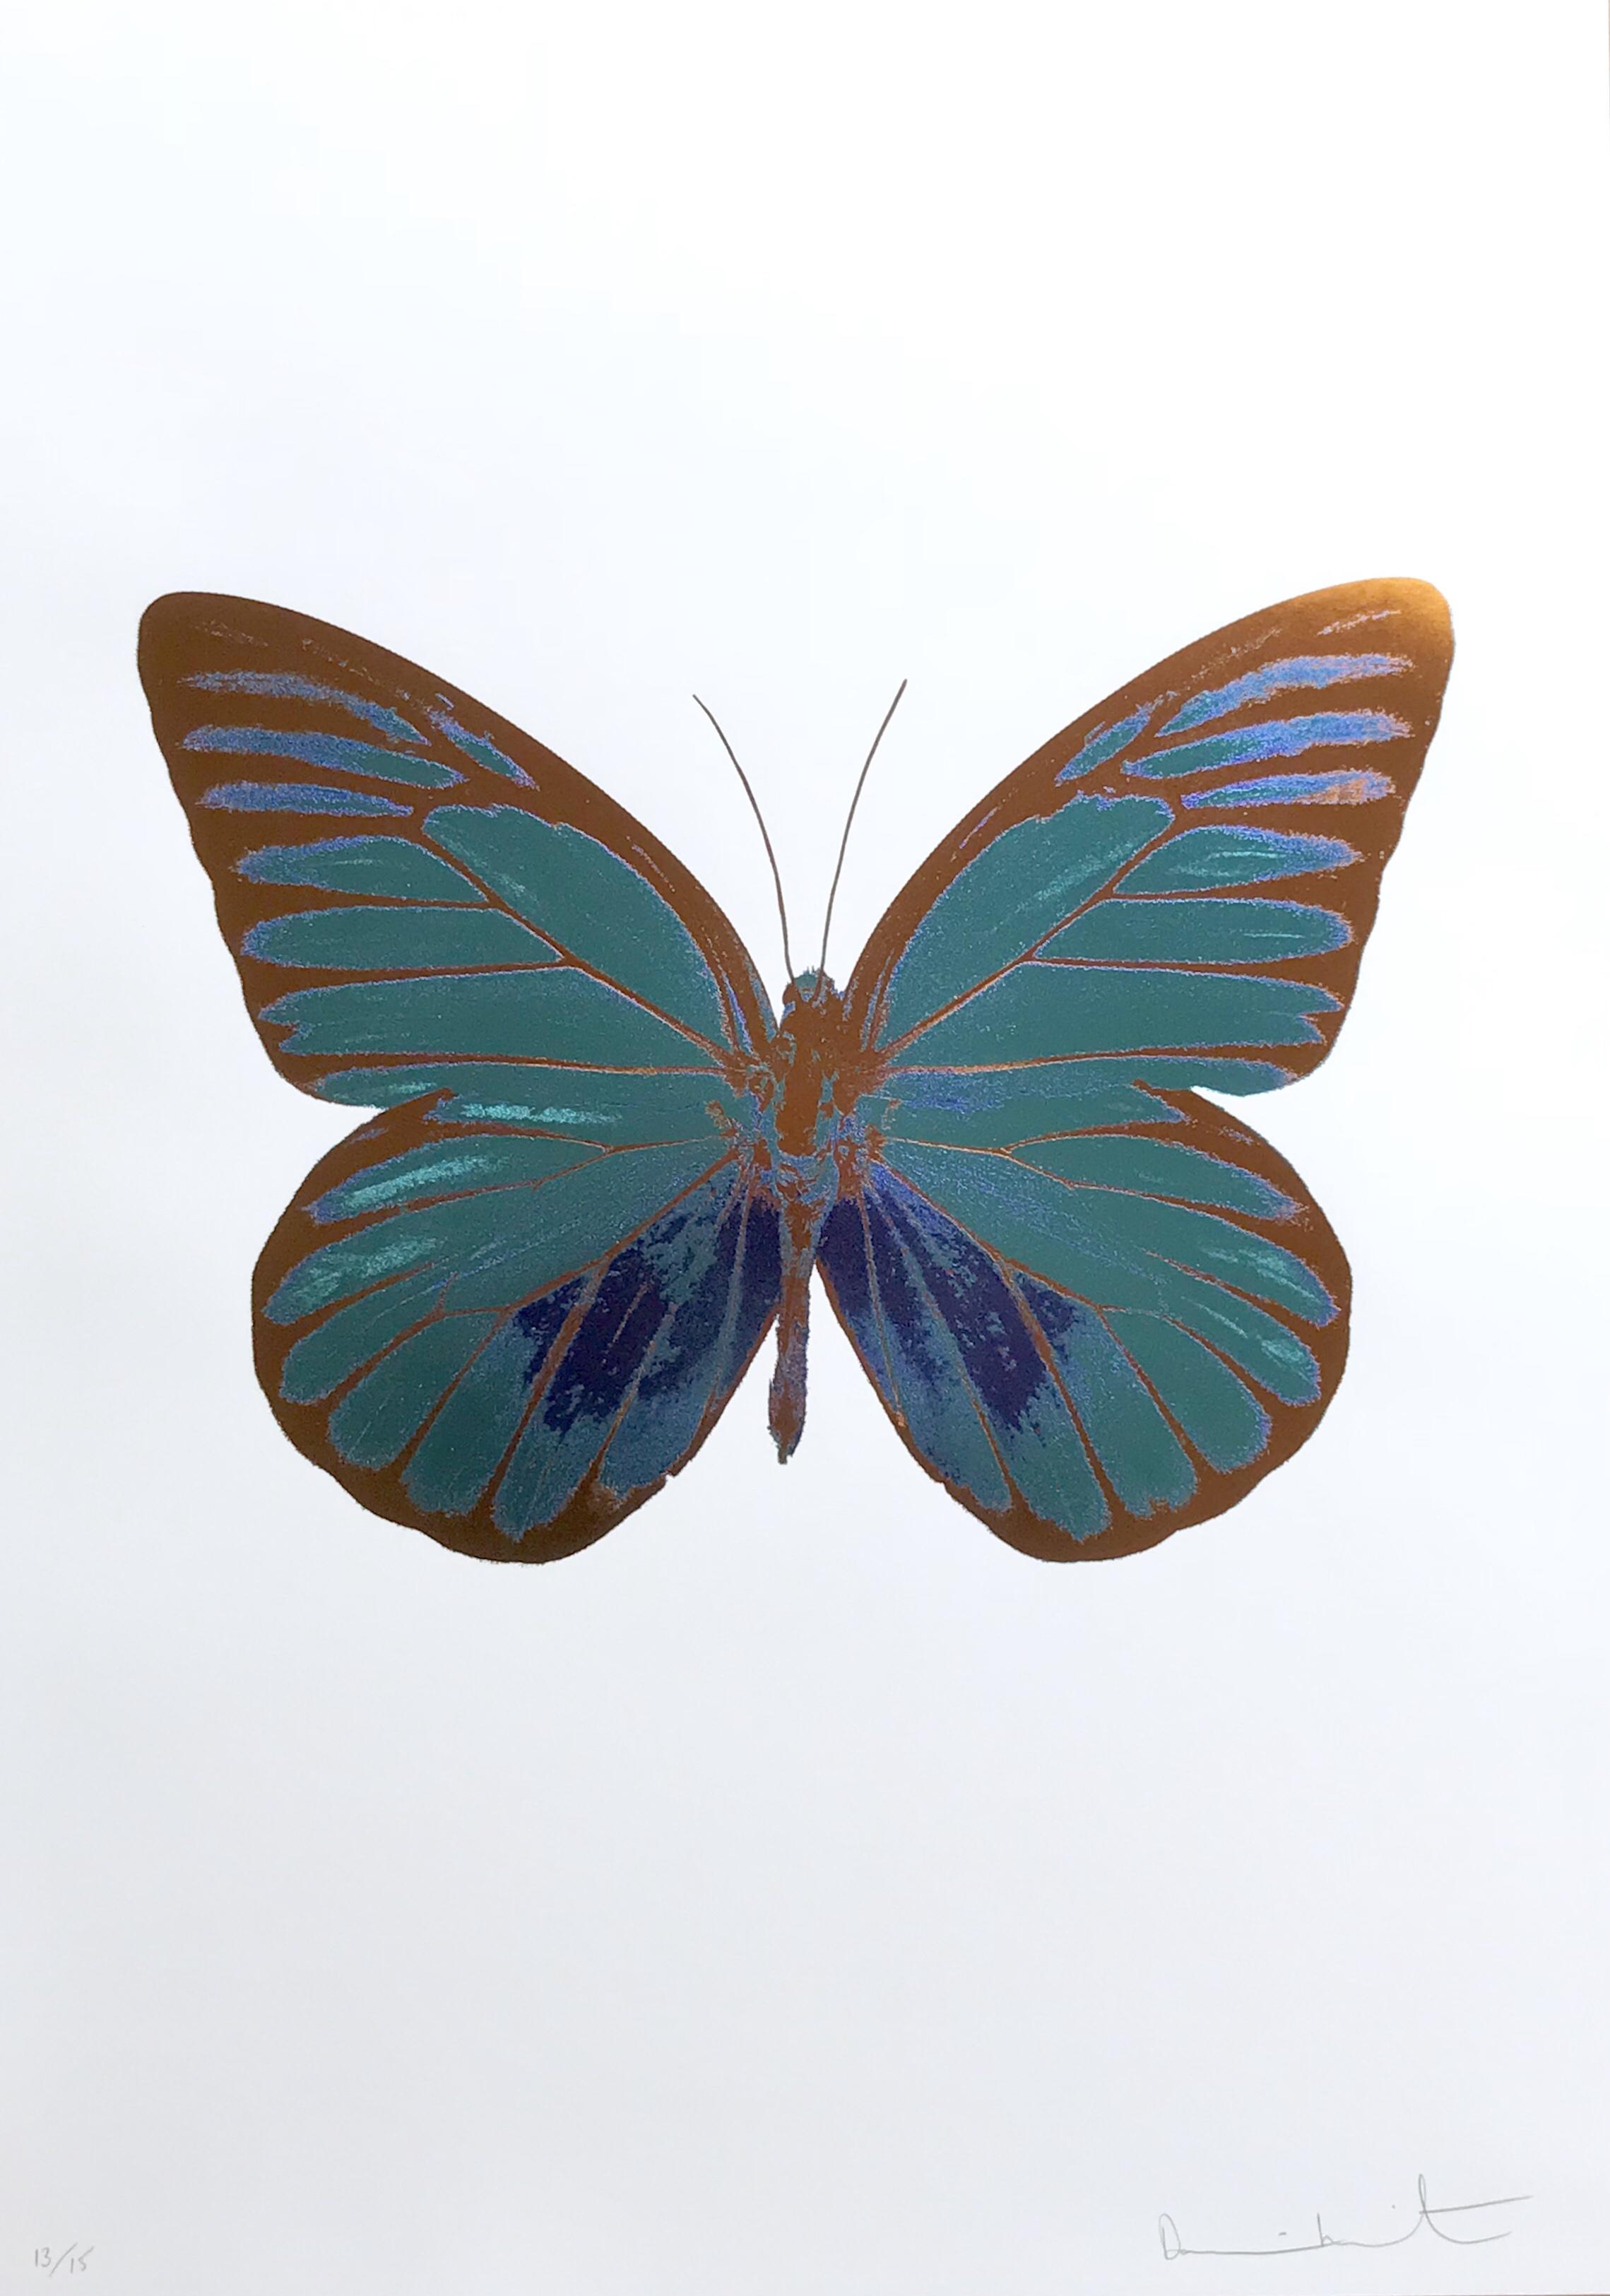 The Souls I, Topaz-Westminster Blue-Prairie Copper